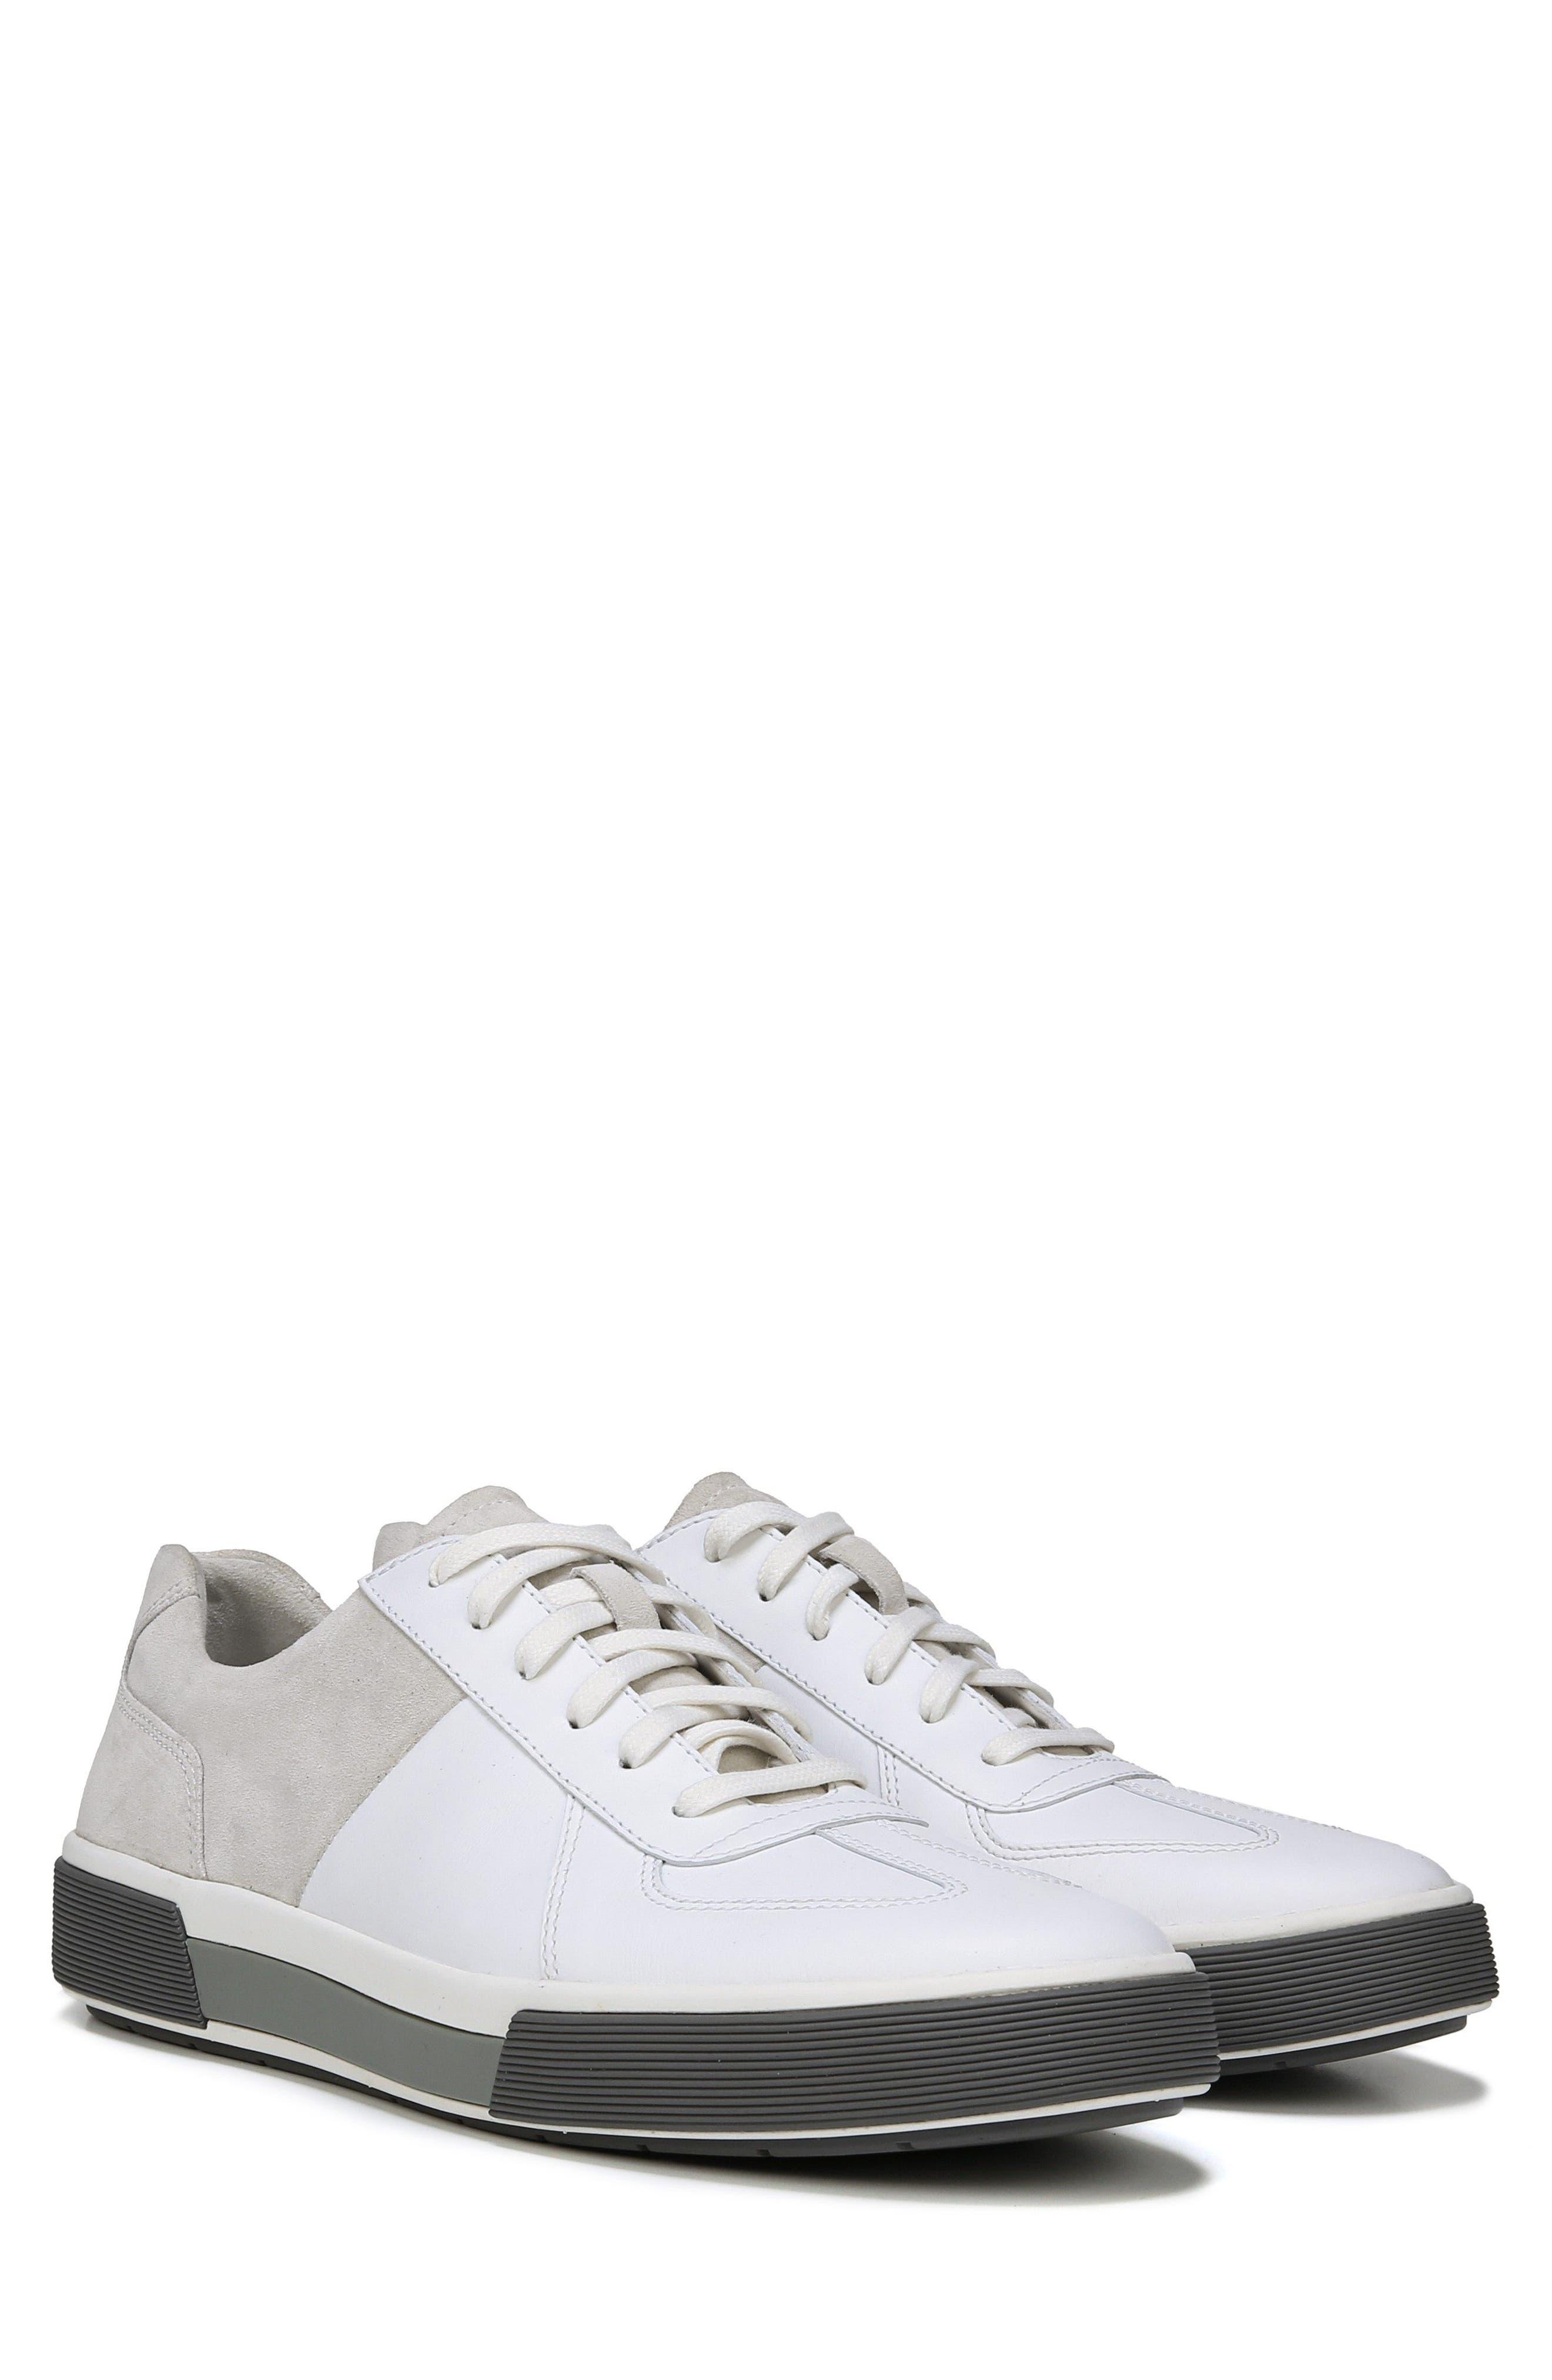 VINCE, Rogue Low Top Sneaker, Alternate thumbnail 6, color, WHITE/ HORCHATA